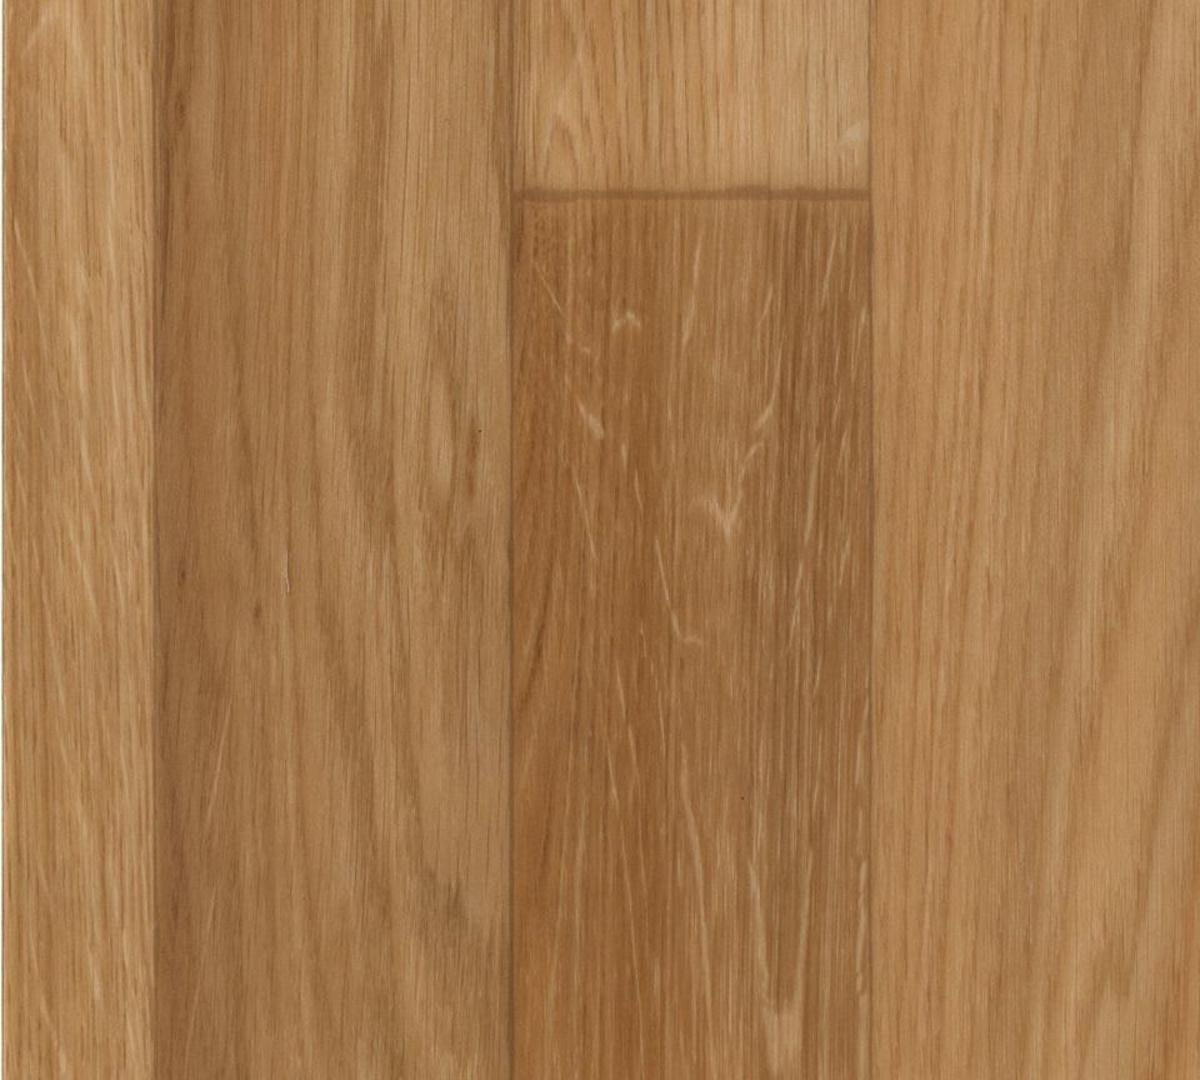 Линолеум Tarkett ACCZENT PRO Oak 01 ACP2000721 (2 мм, 0,7 защита) шир. рул. 2;2,5;3;4м, КМ2